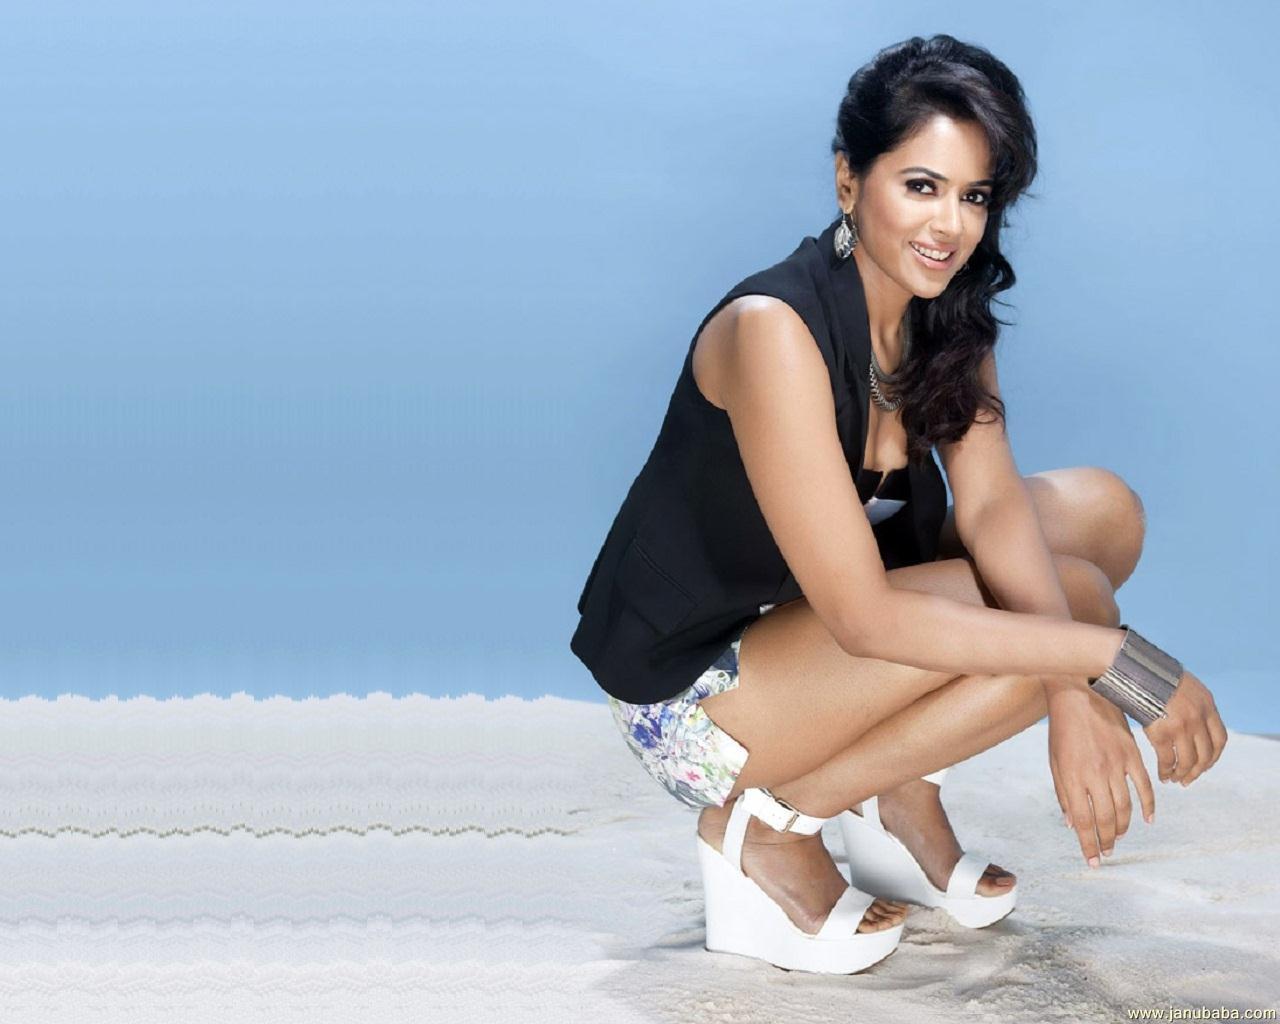 Reddy sameera indian actress nude are